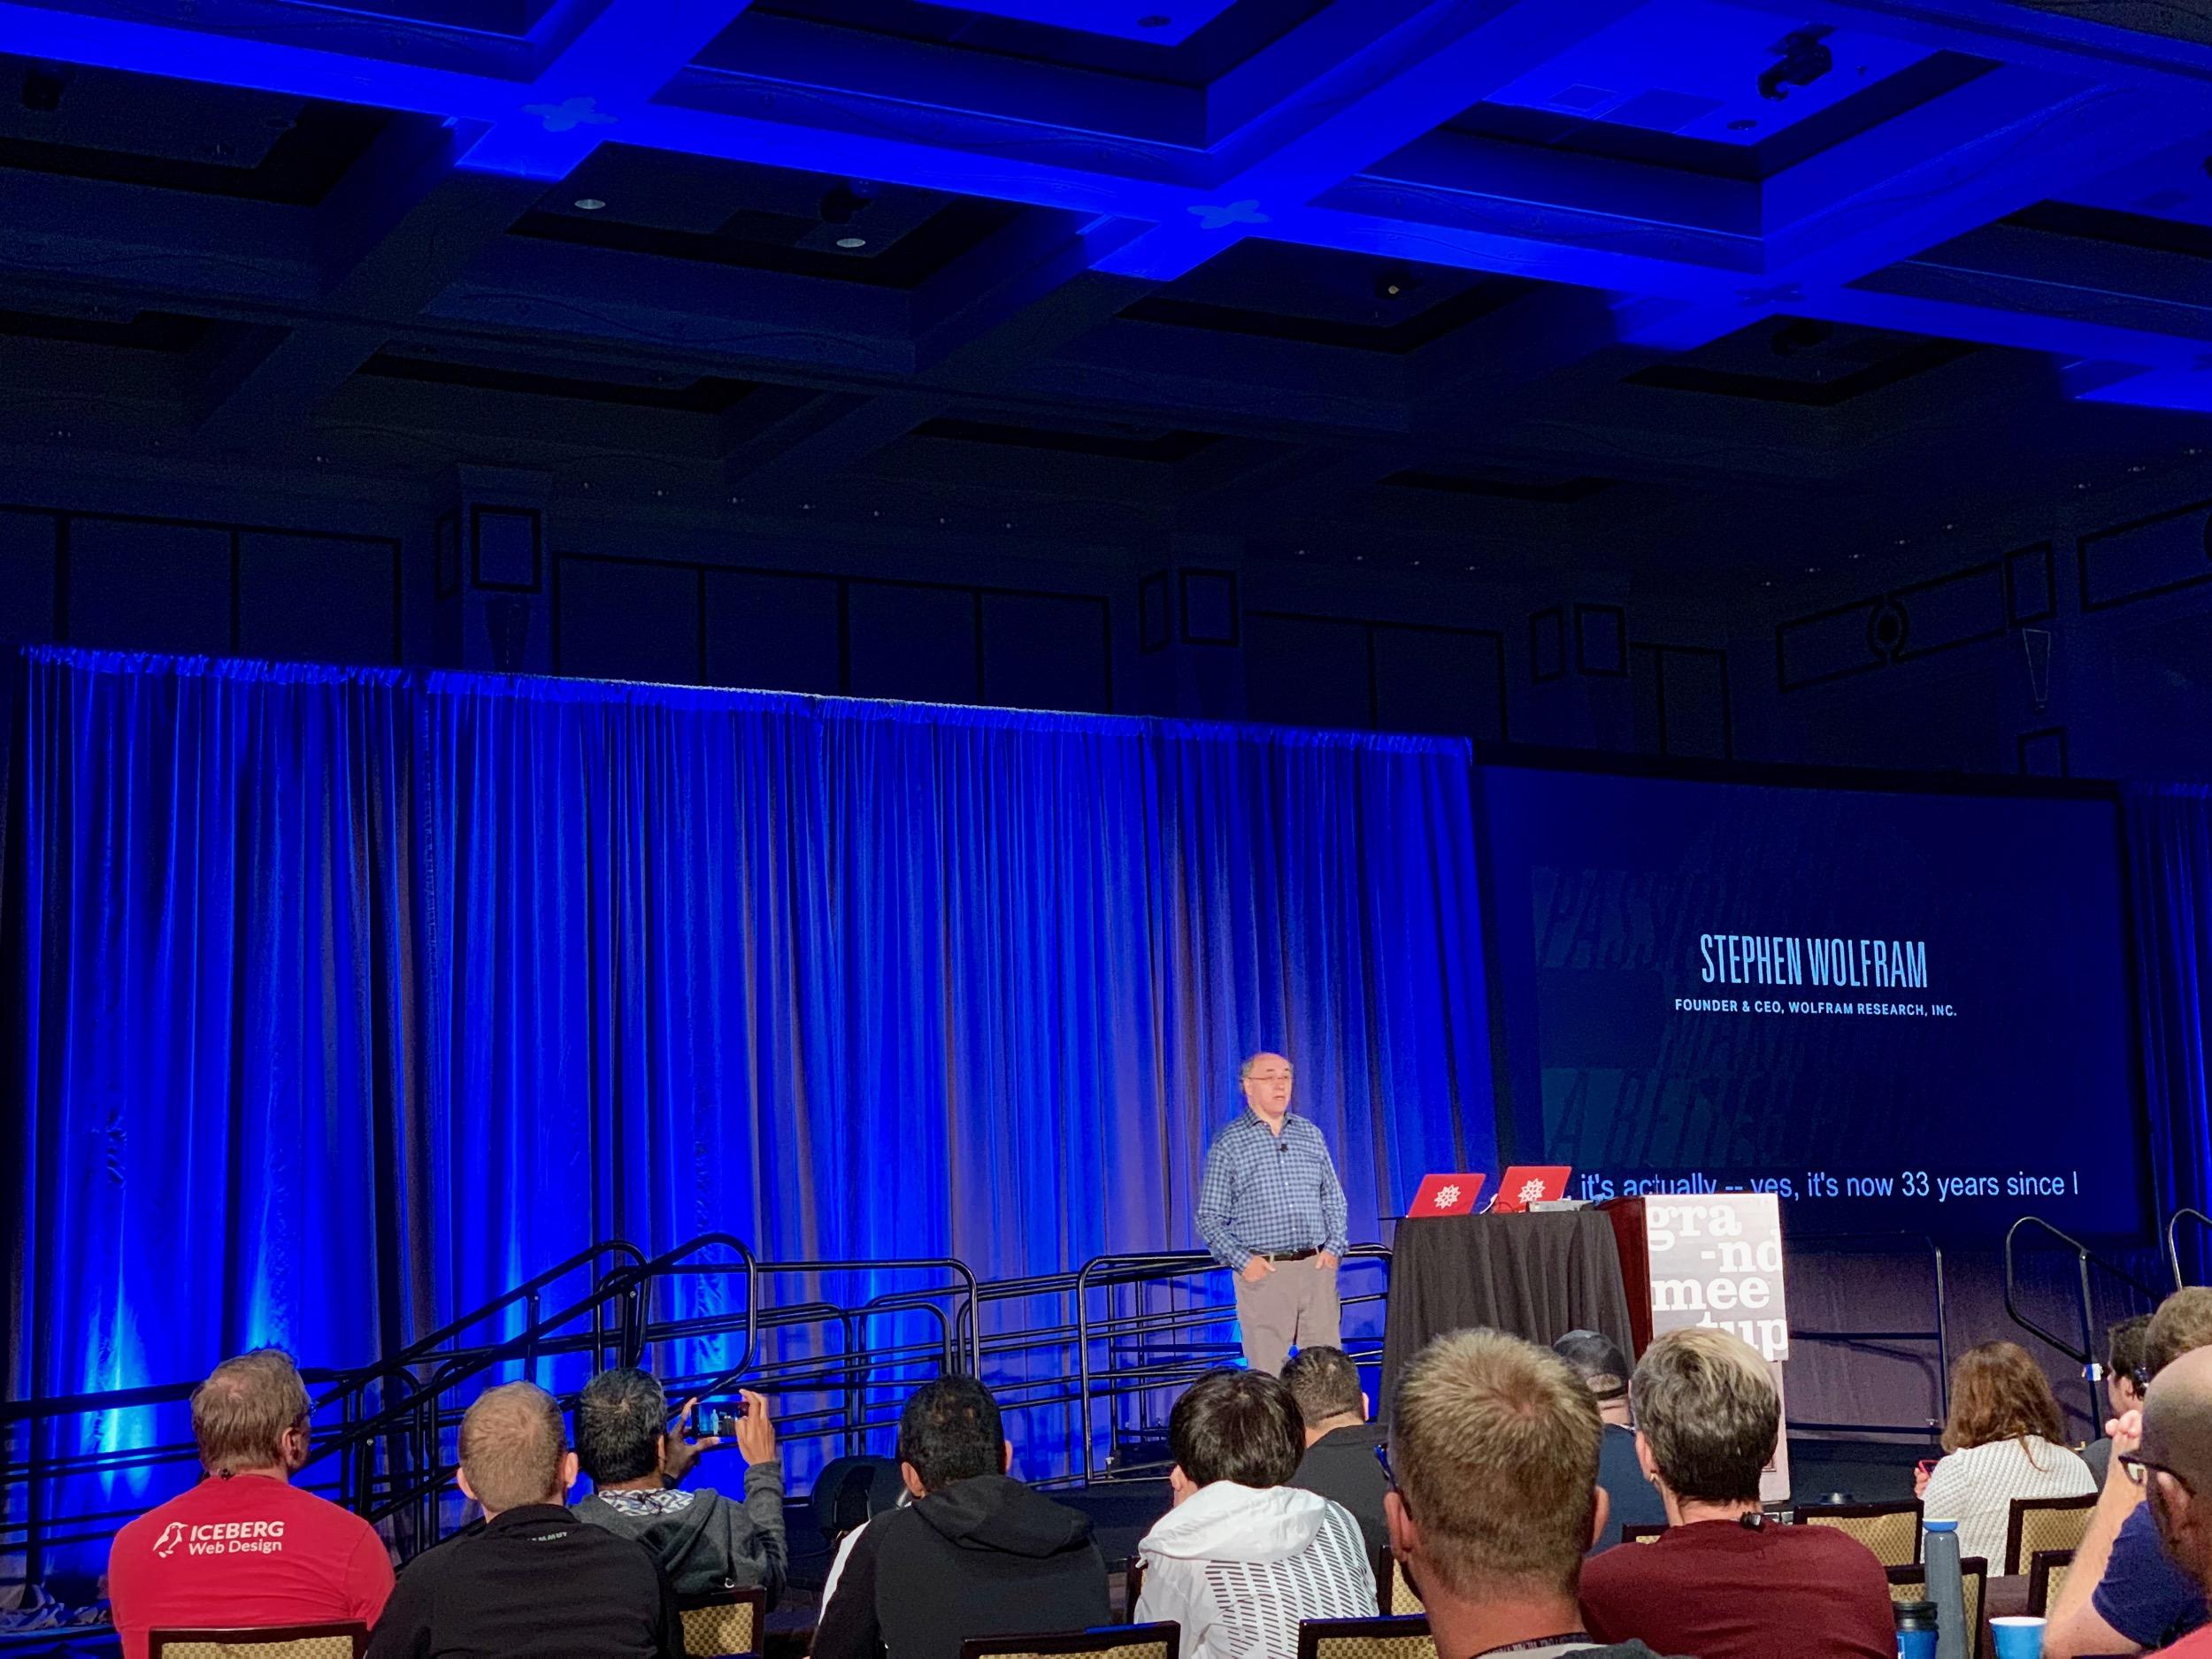 Stephen Wolfram Keynote